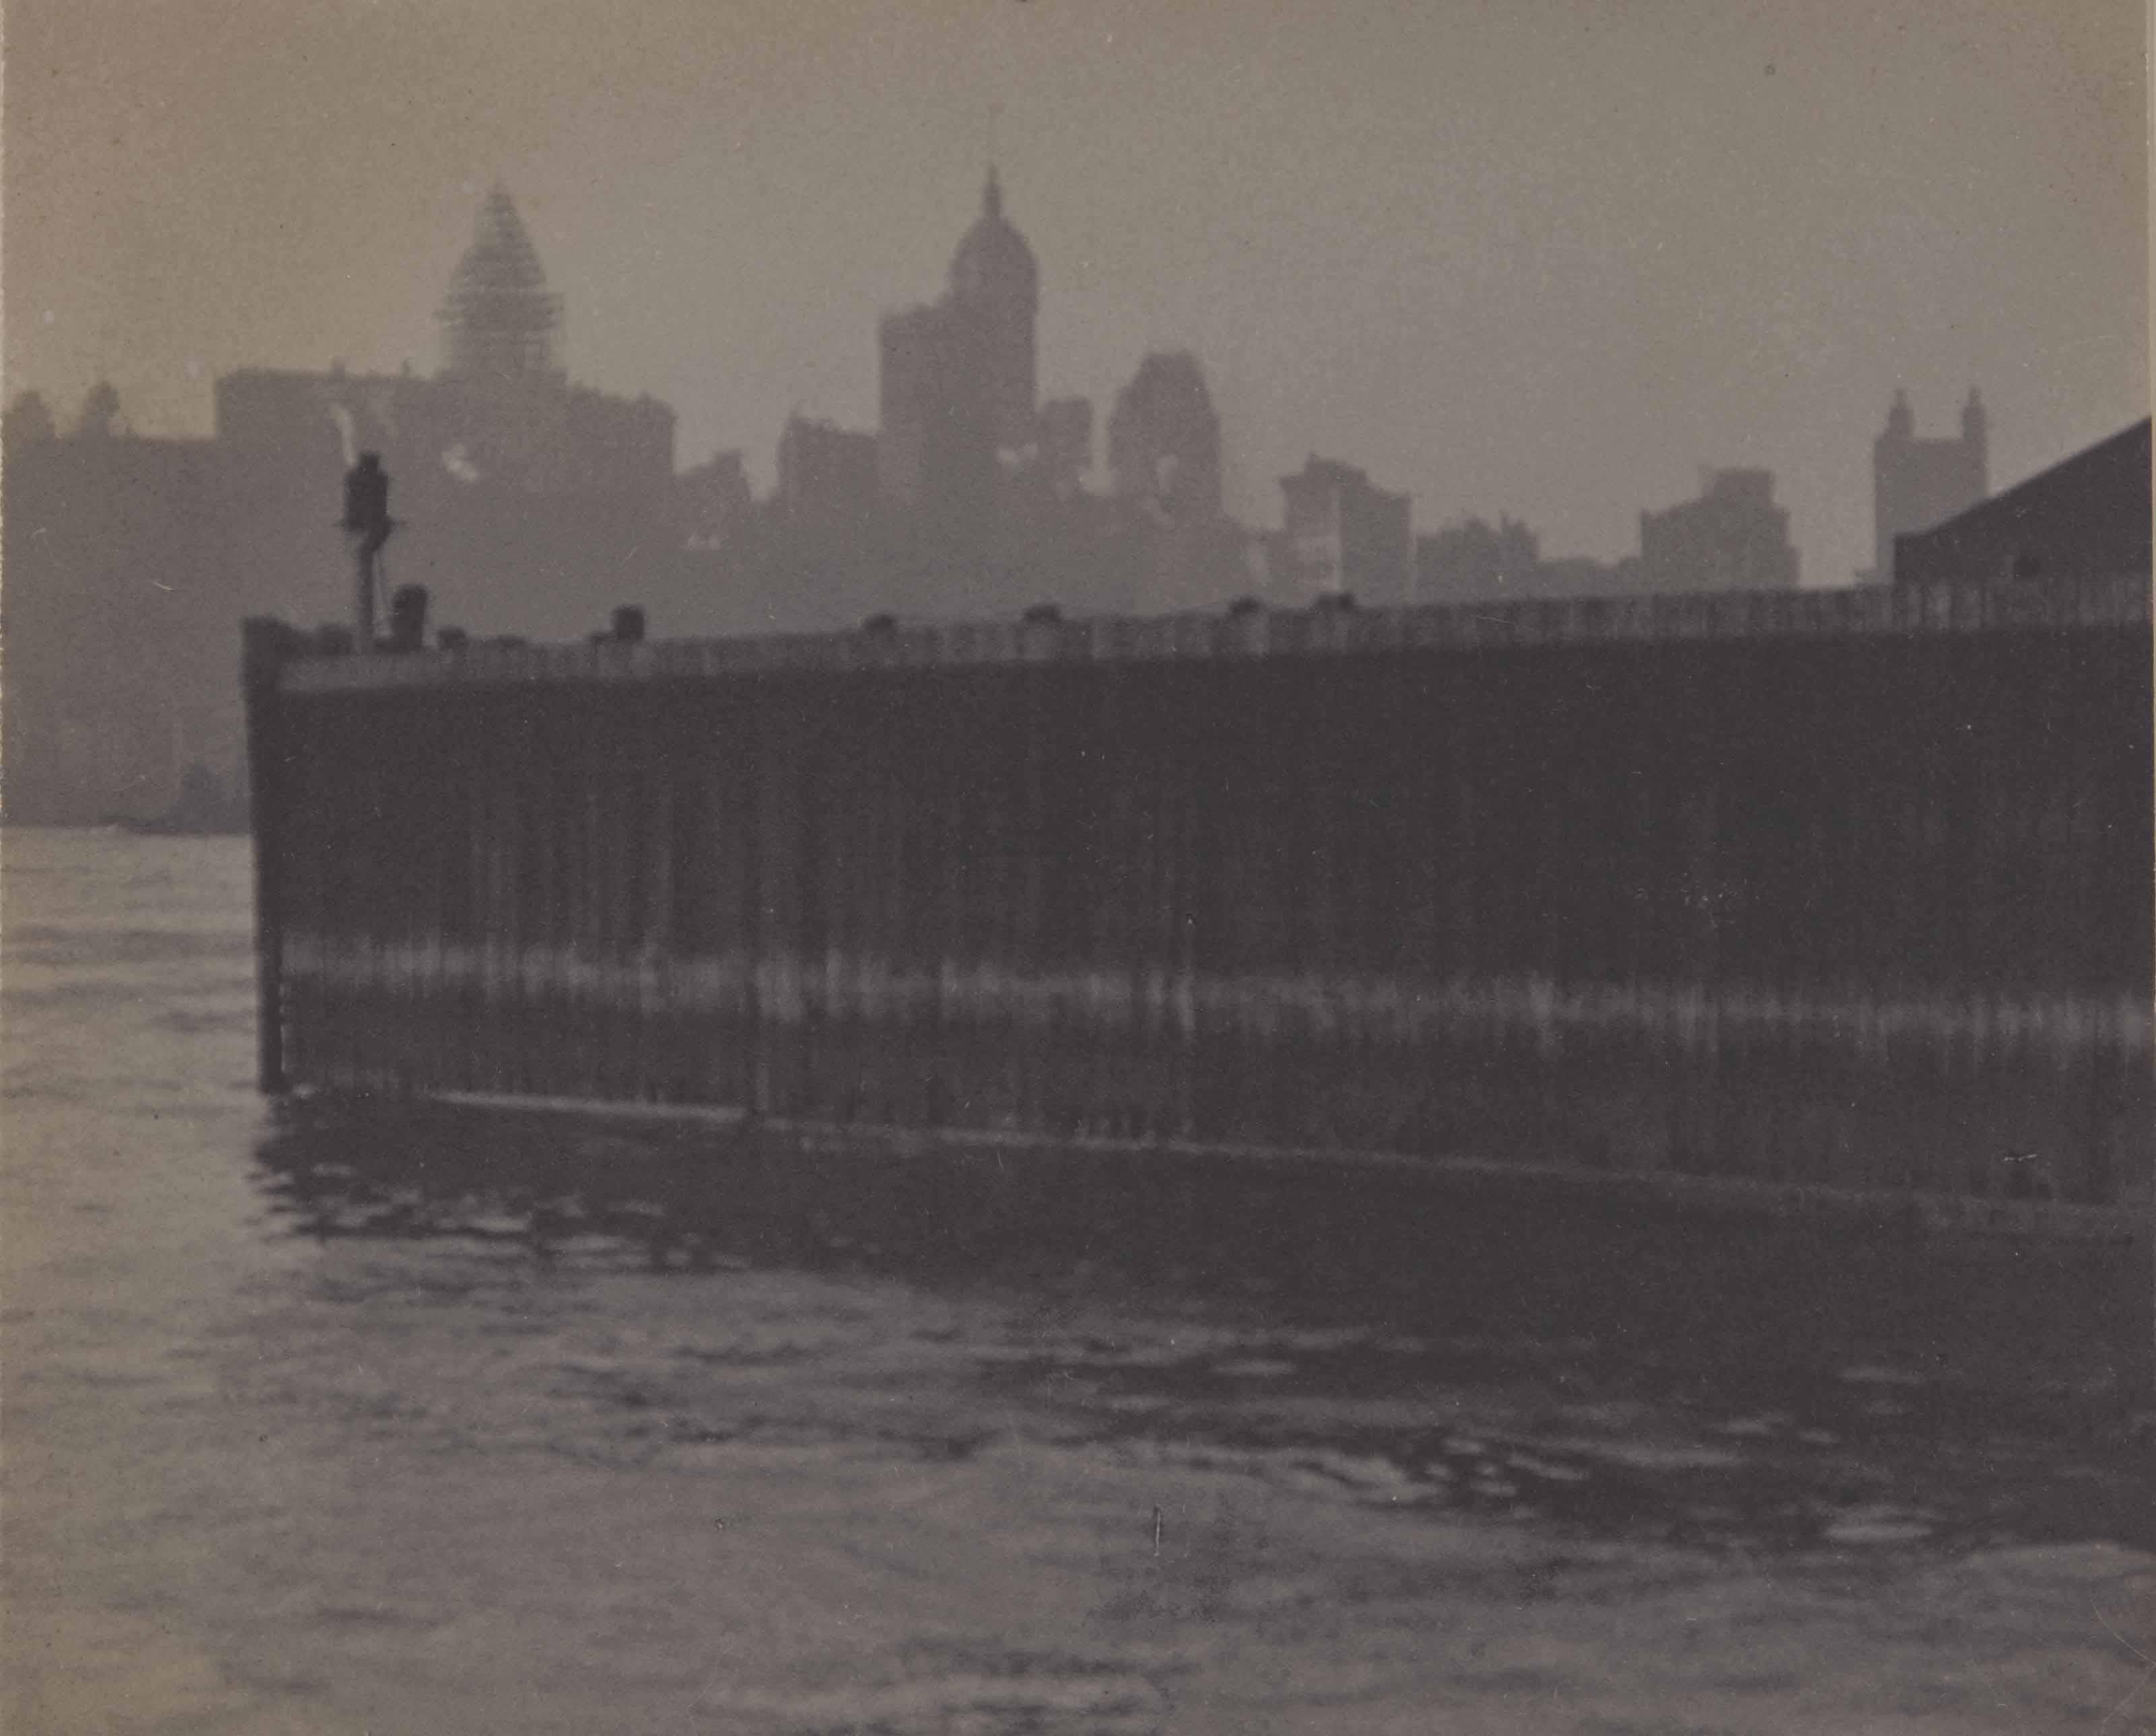 New York Harbour, 1911